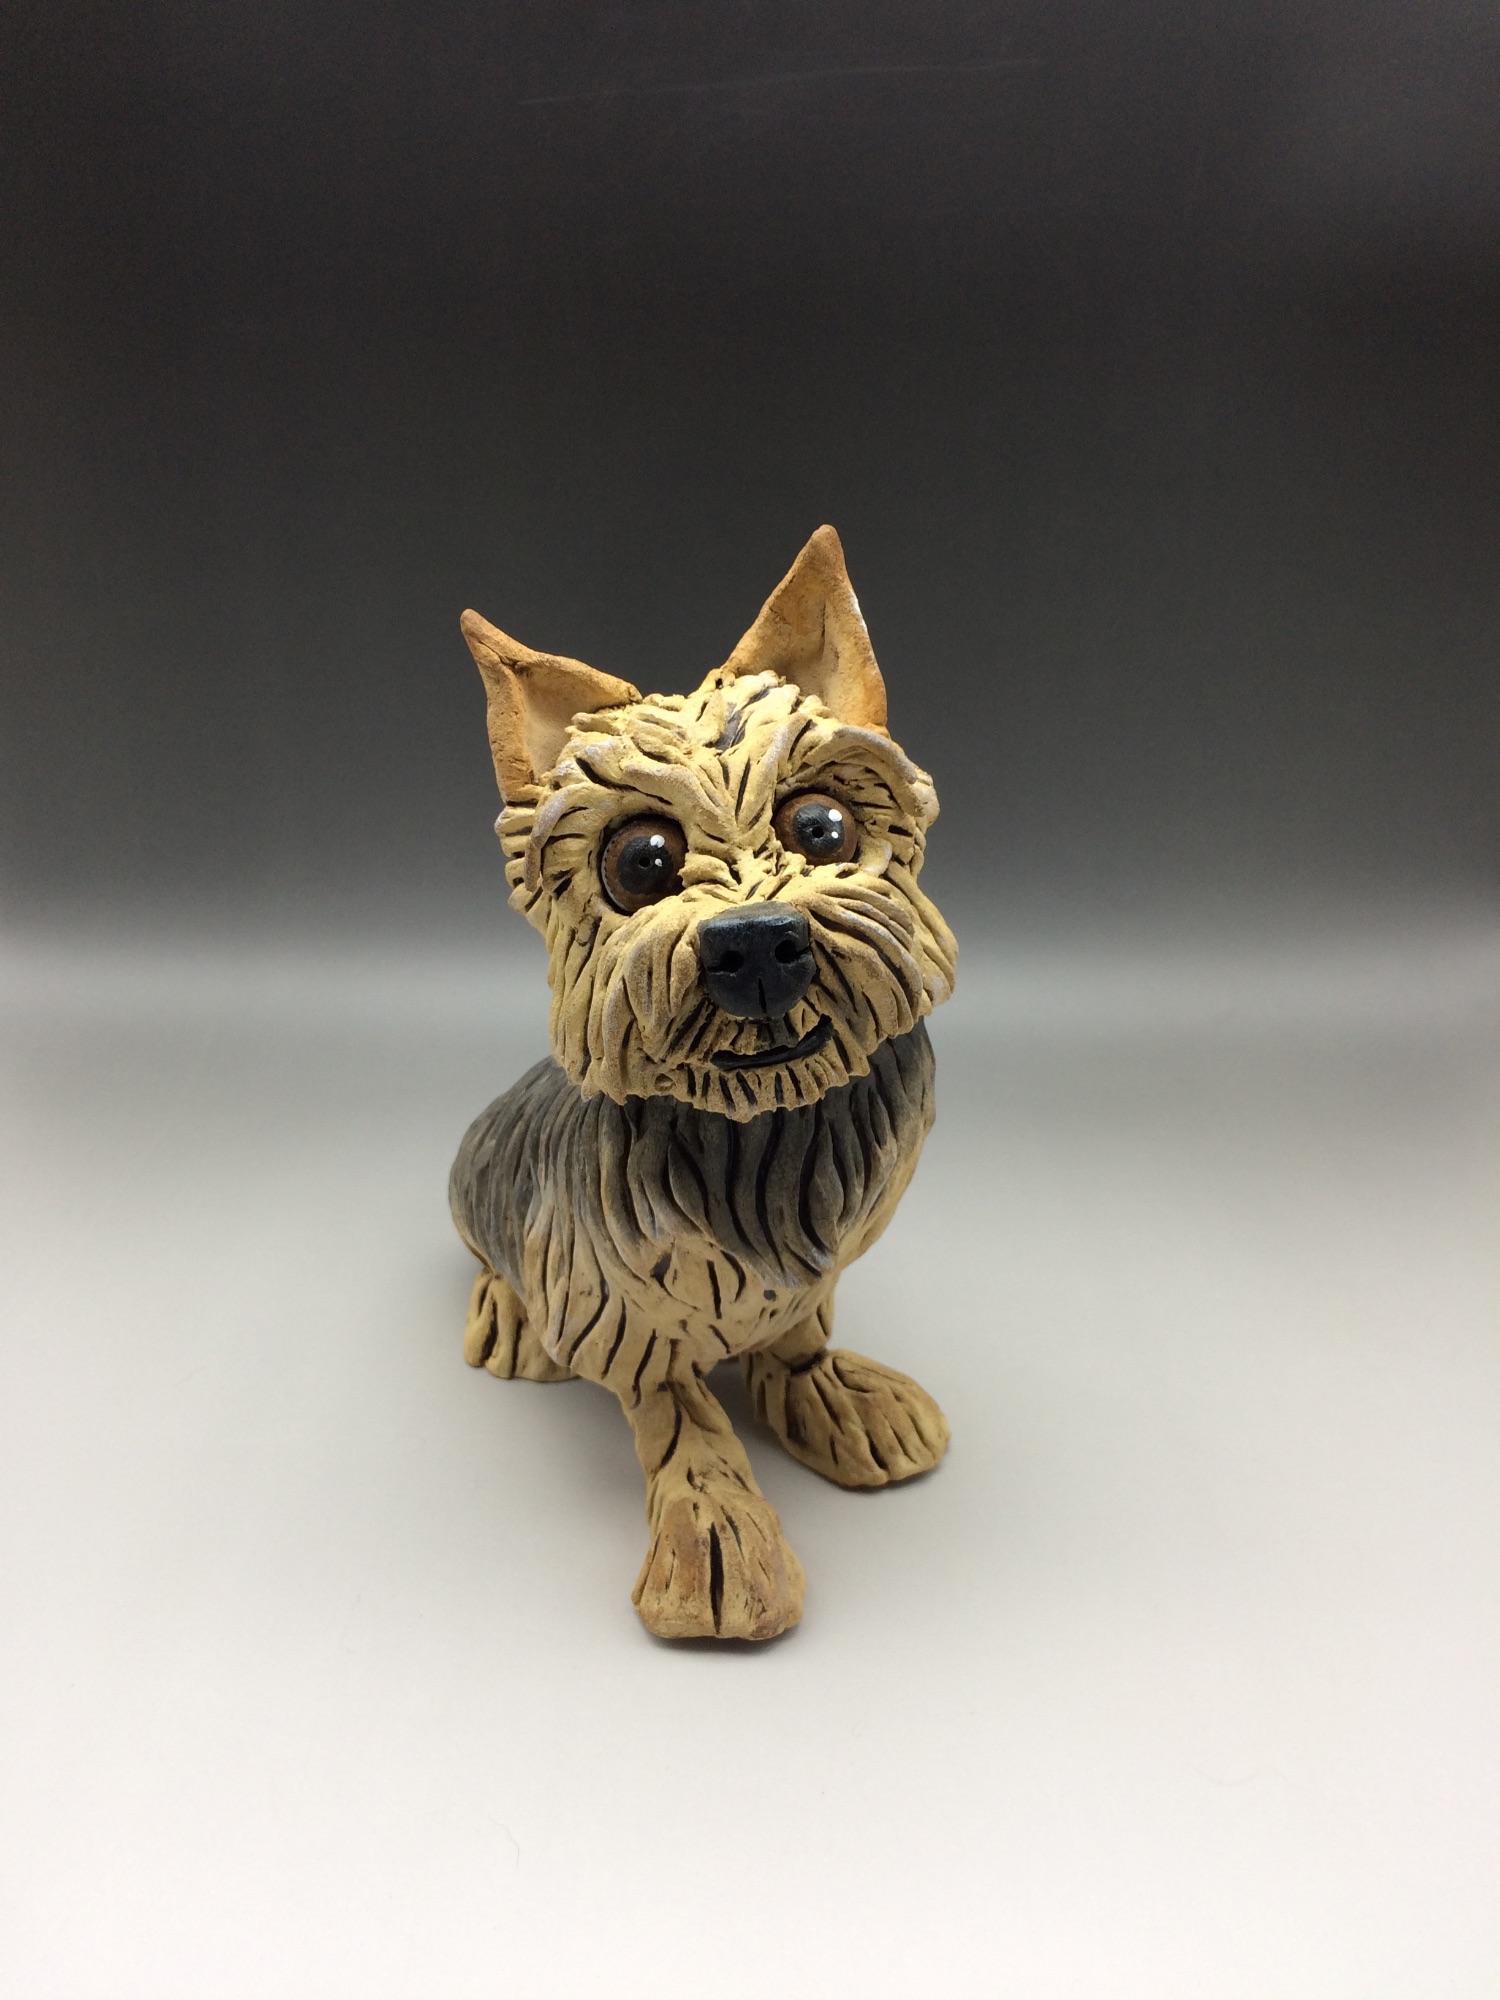 Yorkshire Terrier Dog Sculpture Ceramic